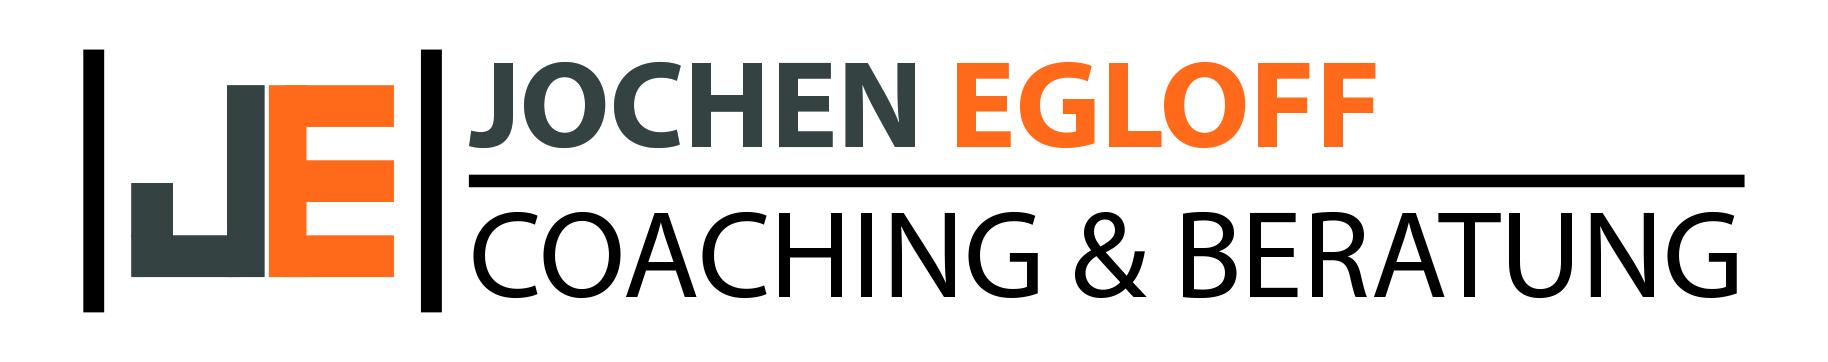 Jochen Egloff Coaching & Beratung